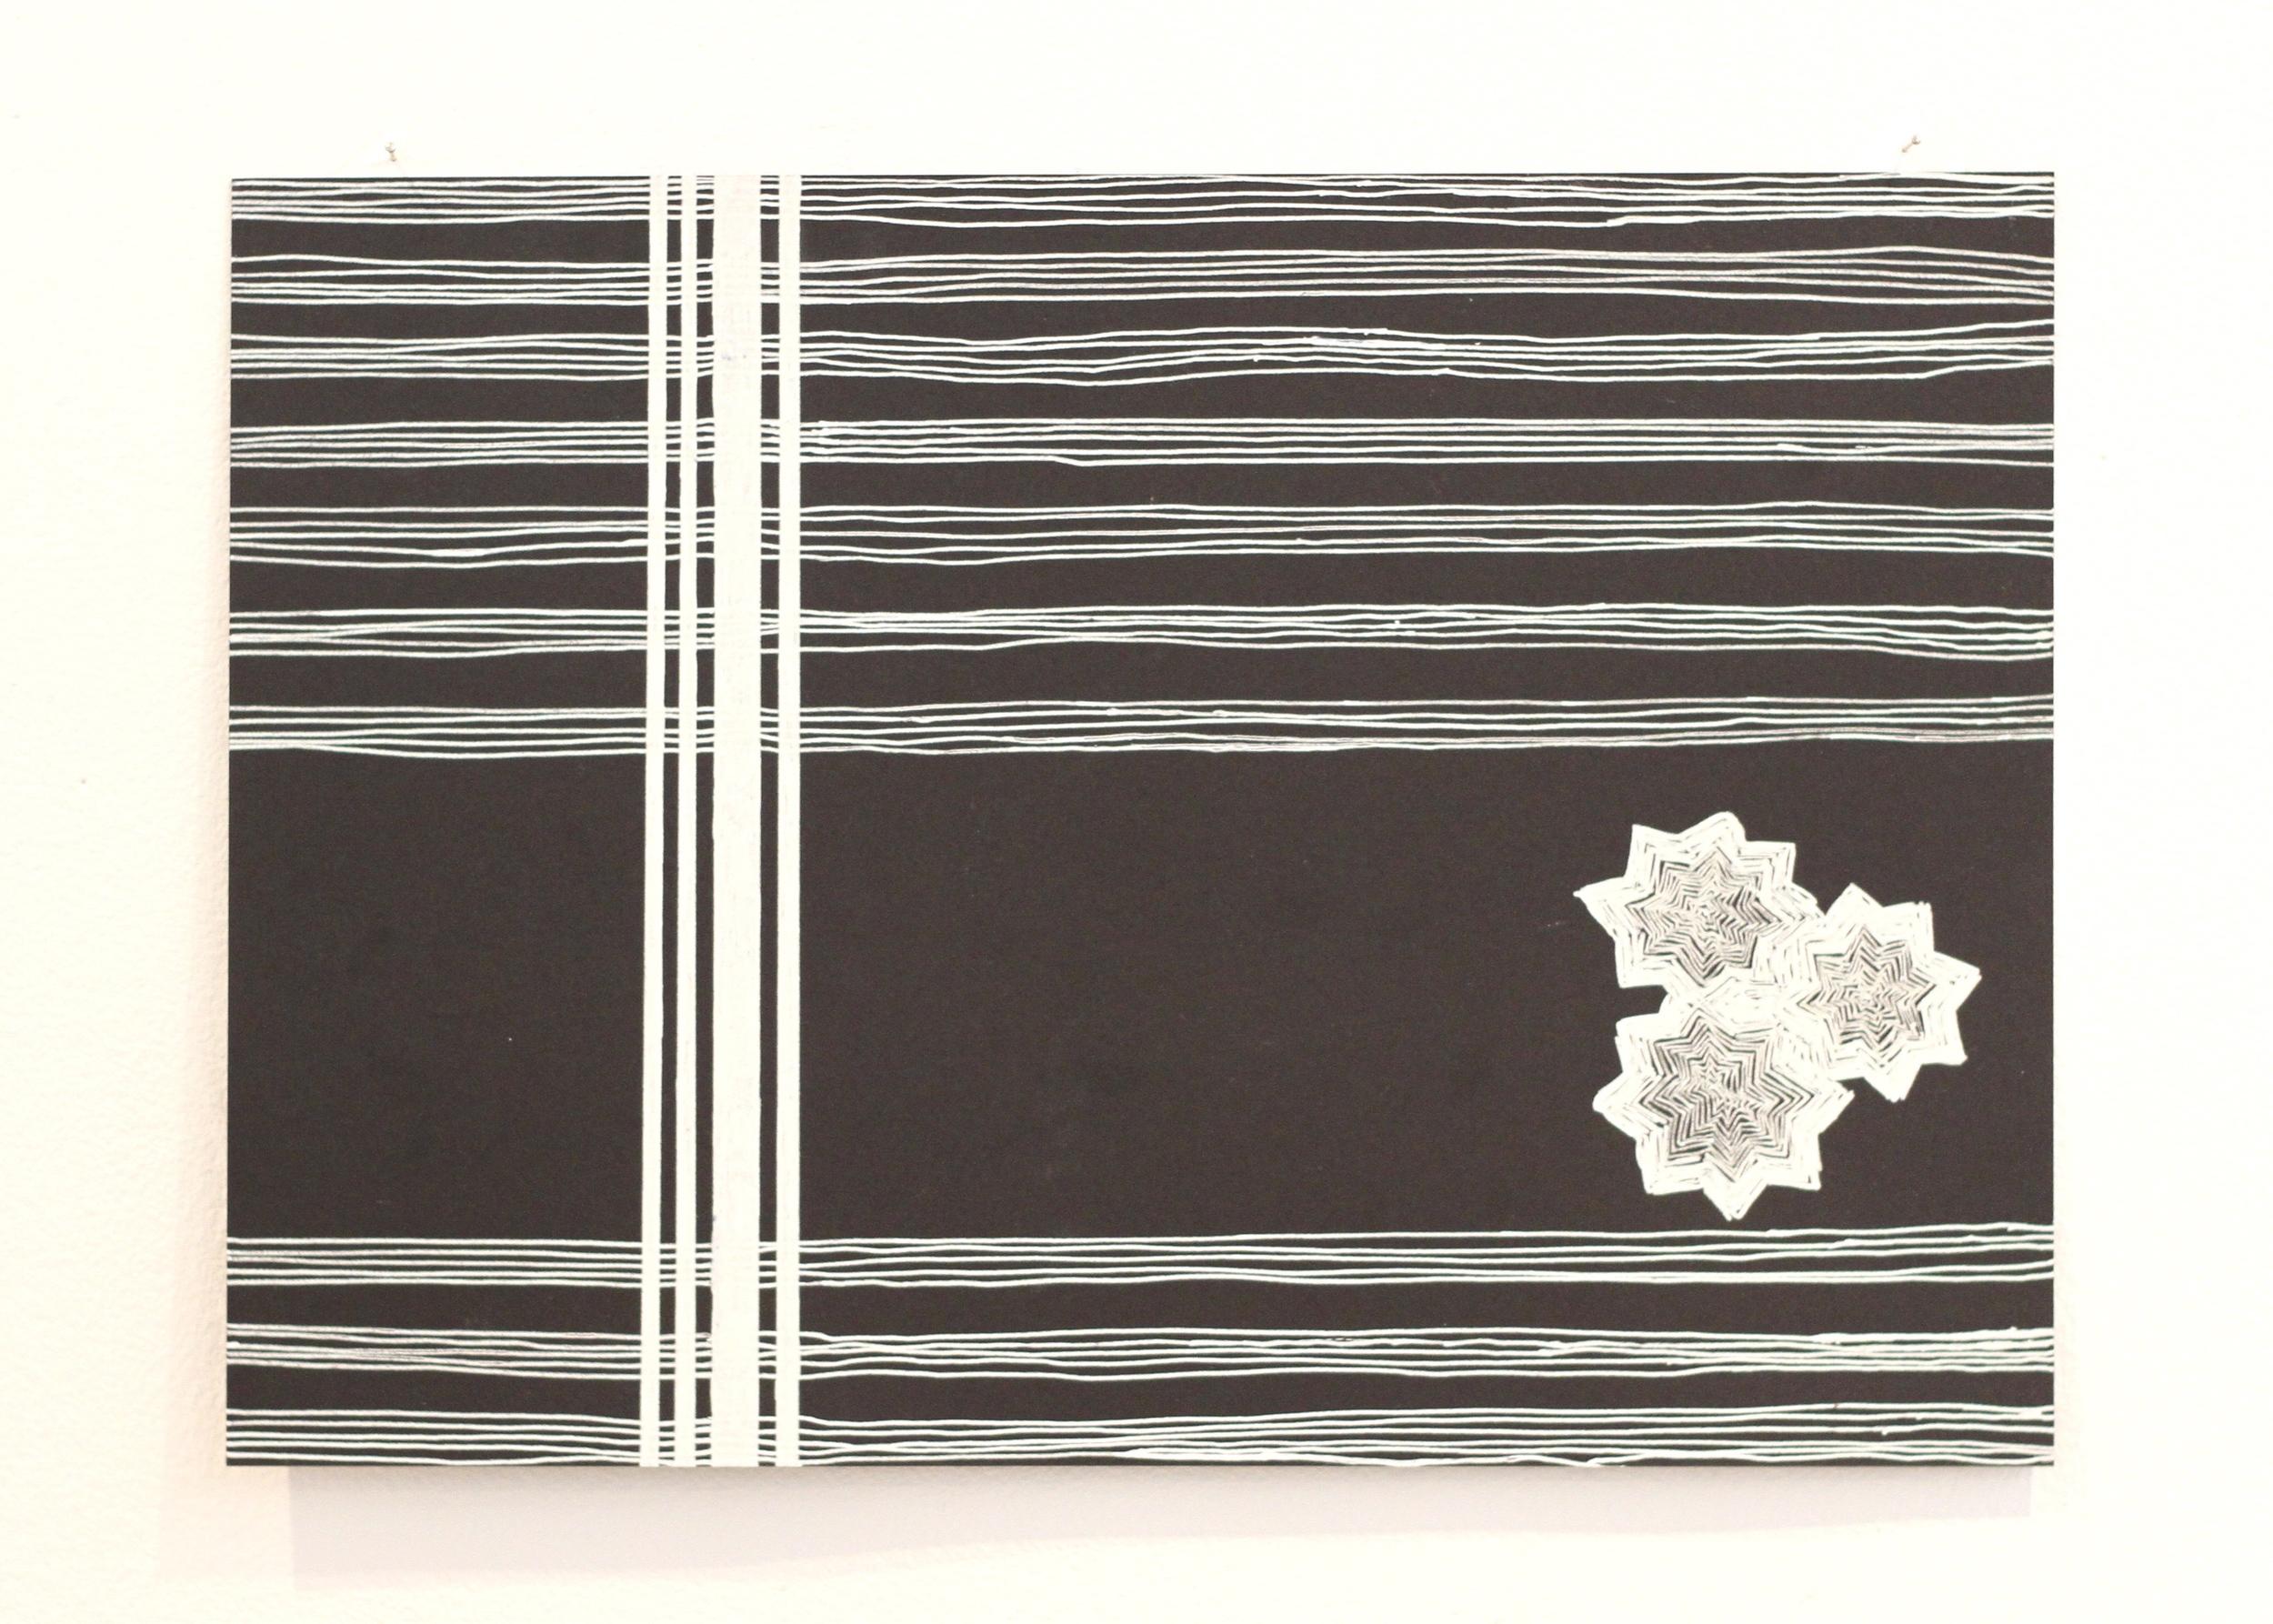 Siting you i le lalolagi / heavens 2, Léuli Eshraghi, ink on card, 21 x 29.5cm, 2014